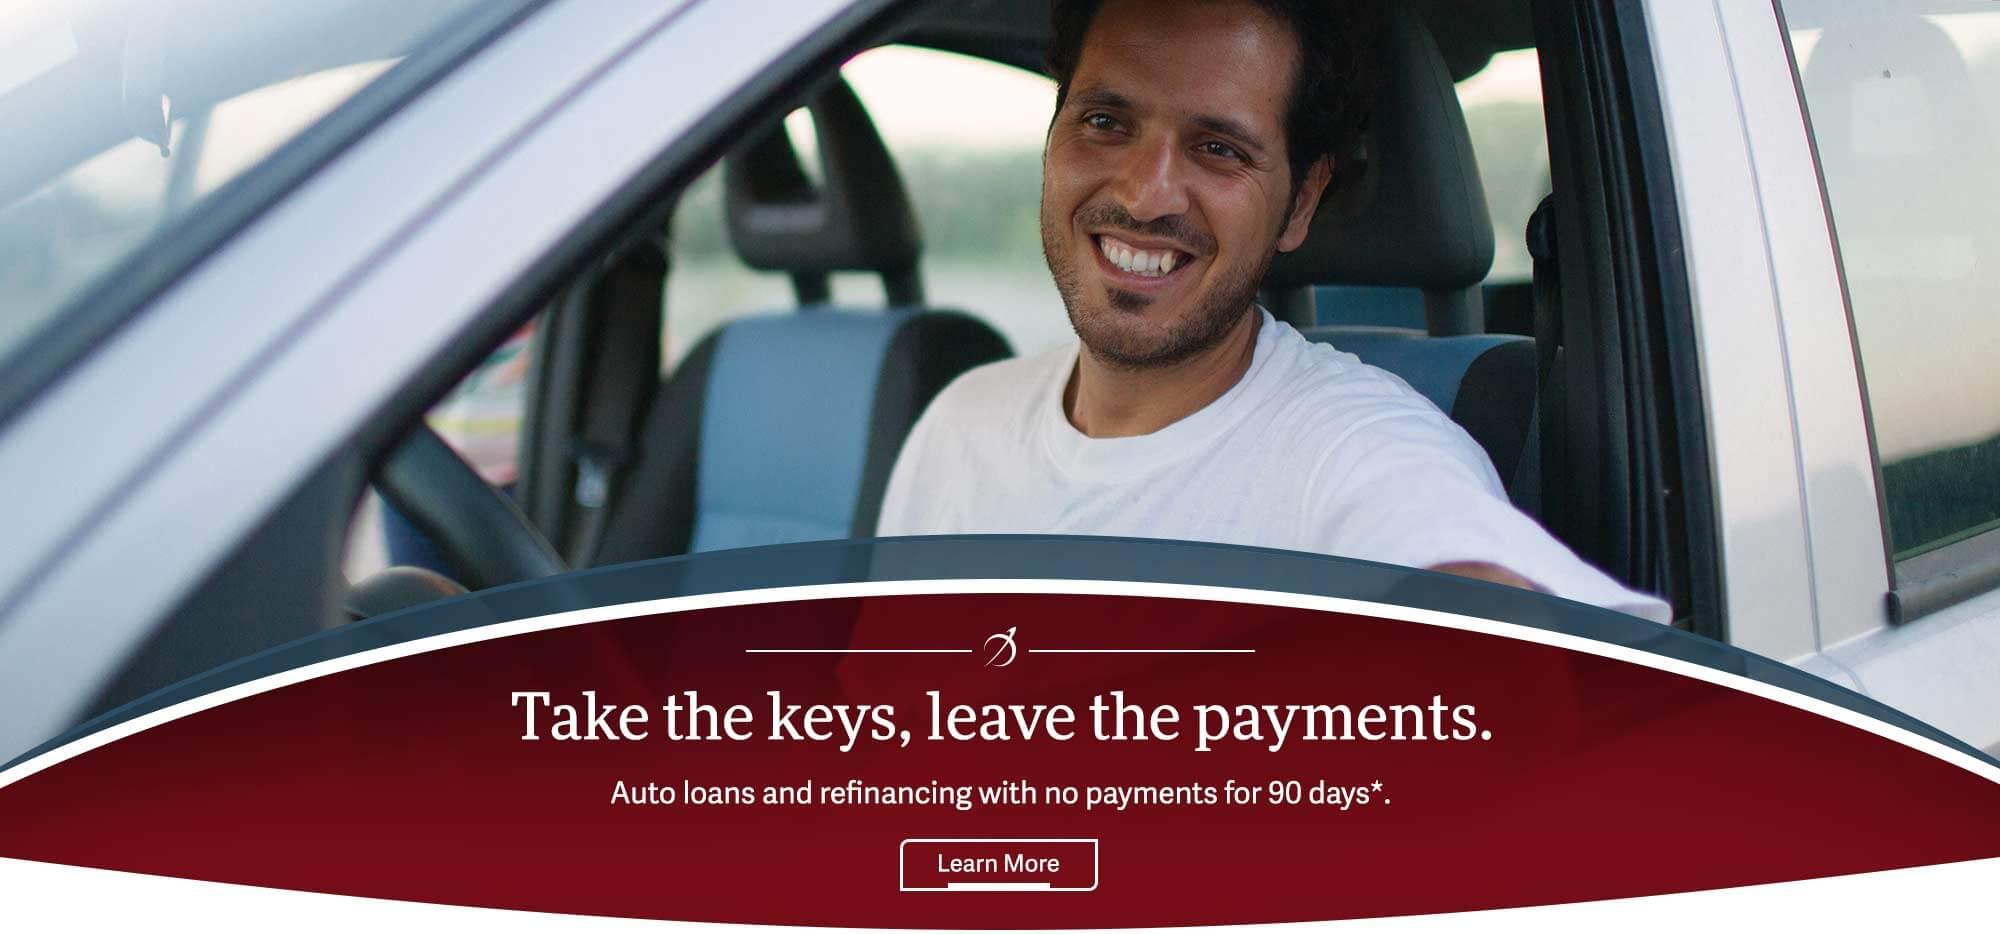 Auto Loans Take the Keys